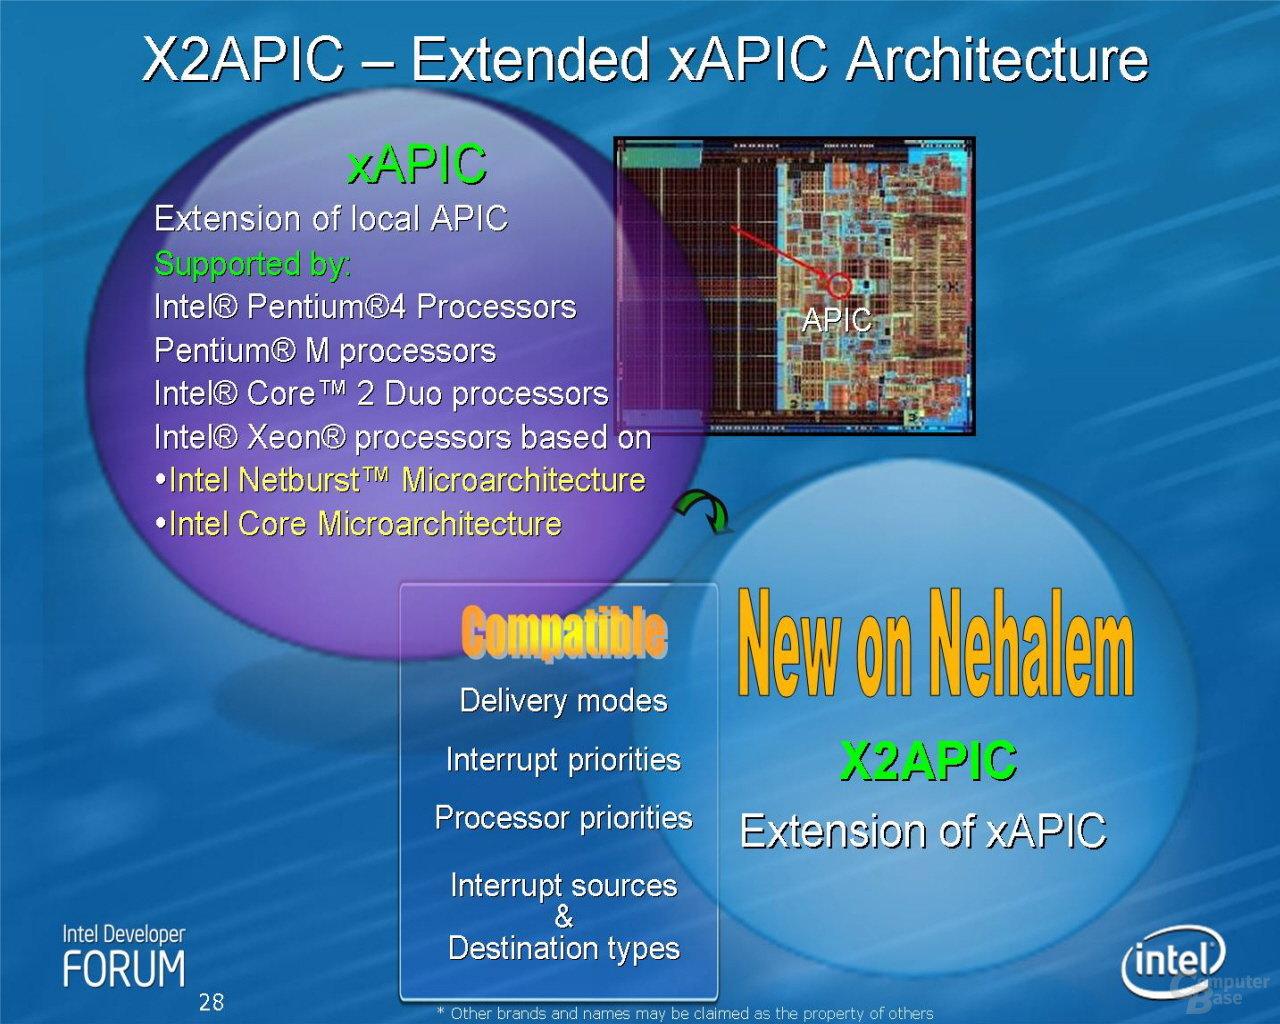 Intel Nehalem mit X2APIC - Extended xAPIC Architecture